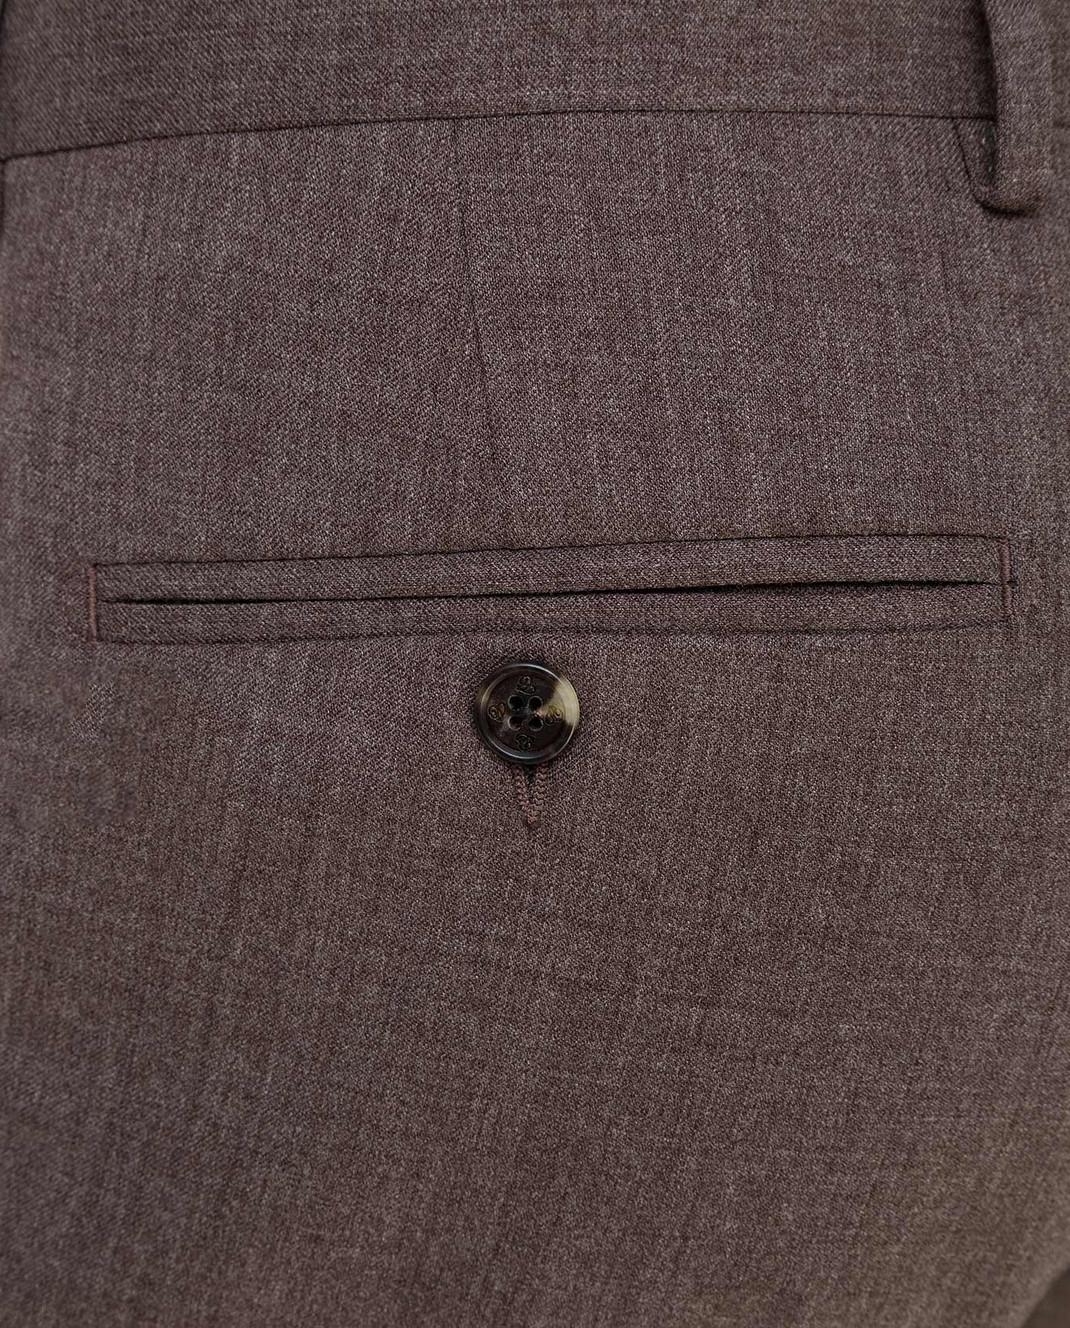 Castello d'Oro Бежевые брюки из шерсти изображение 5